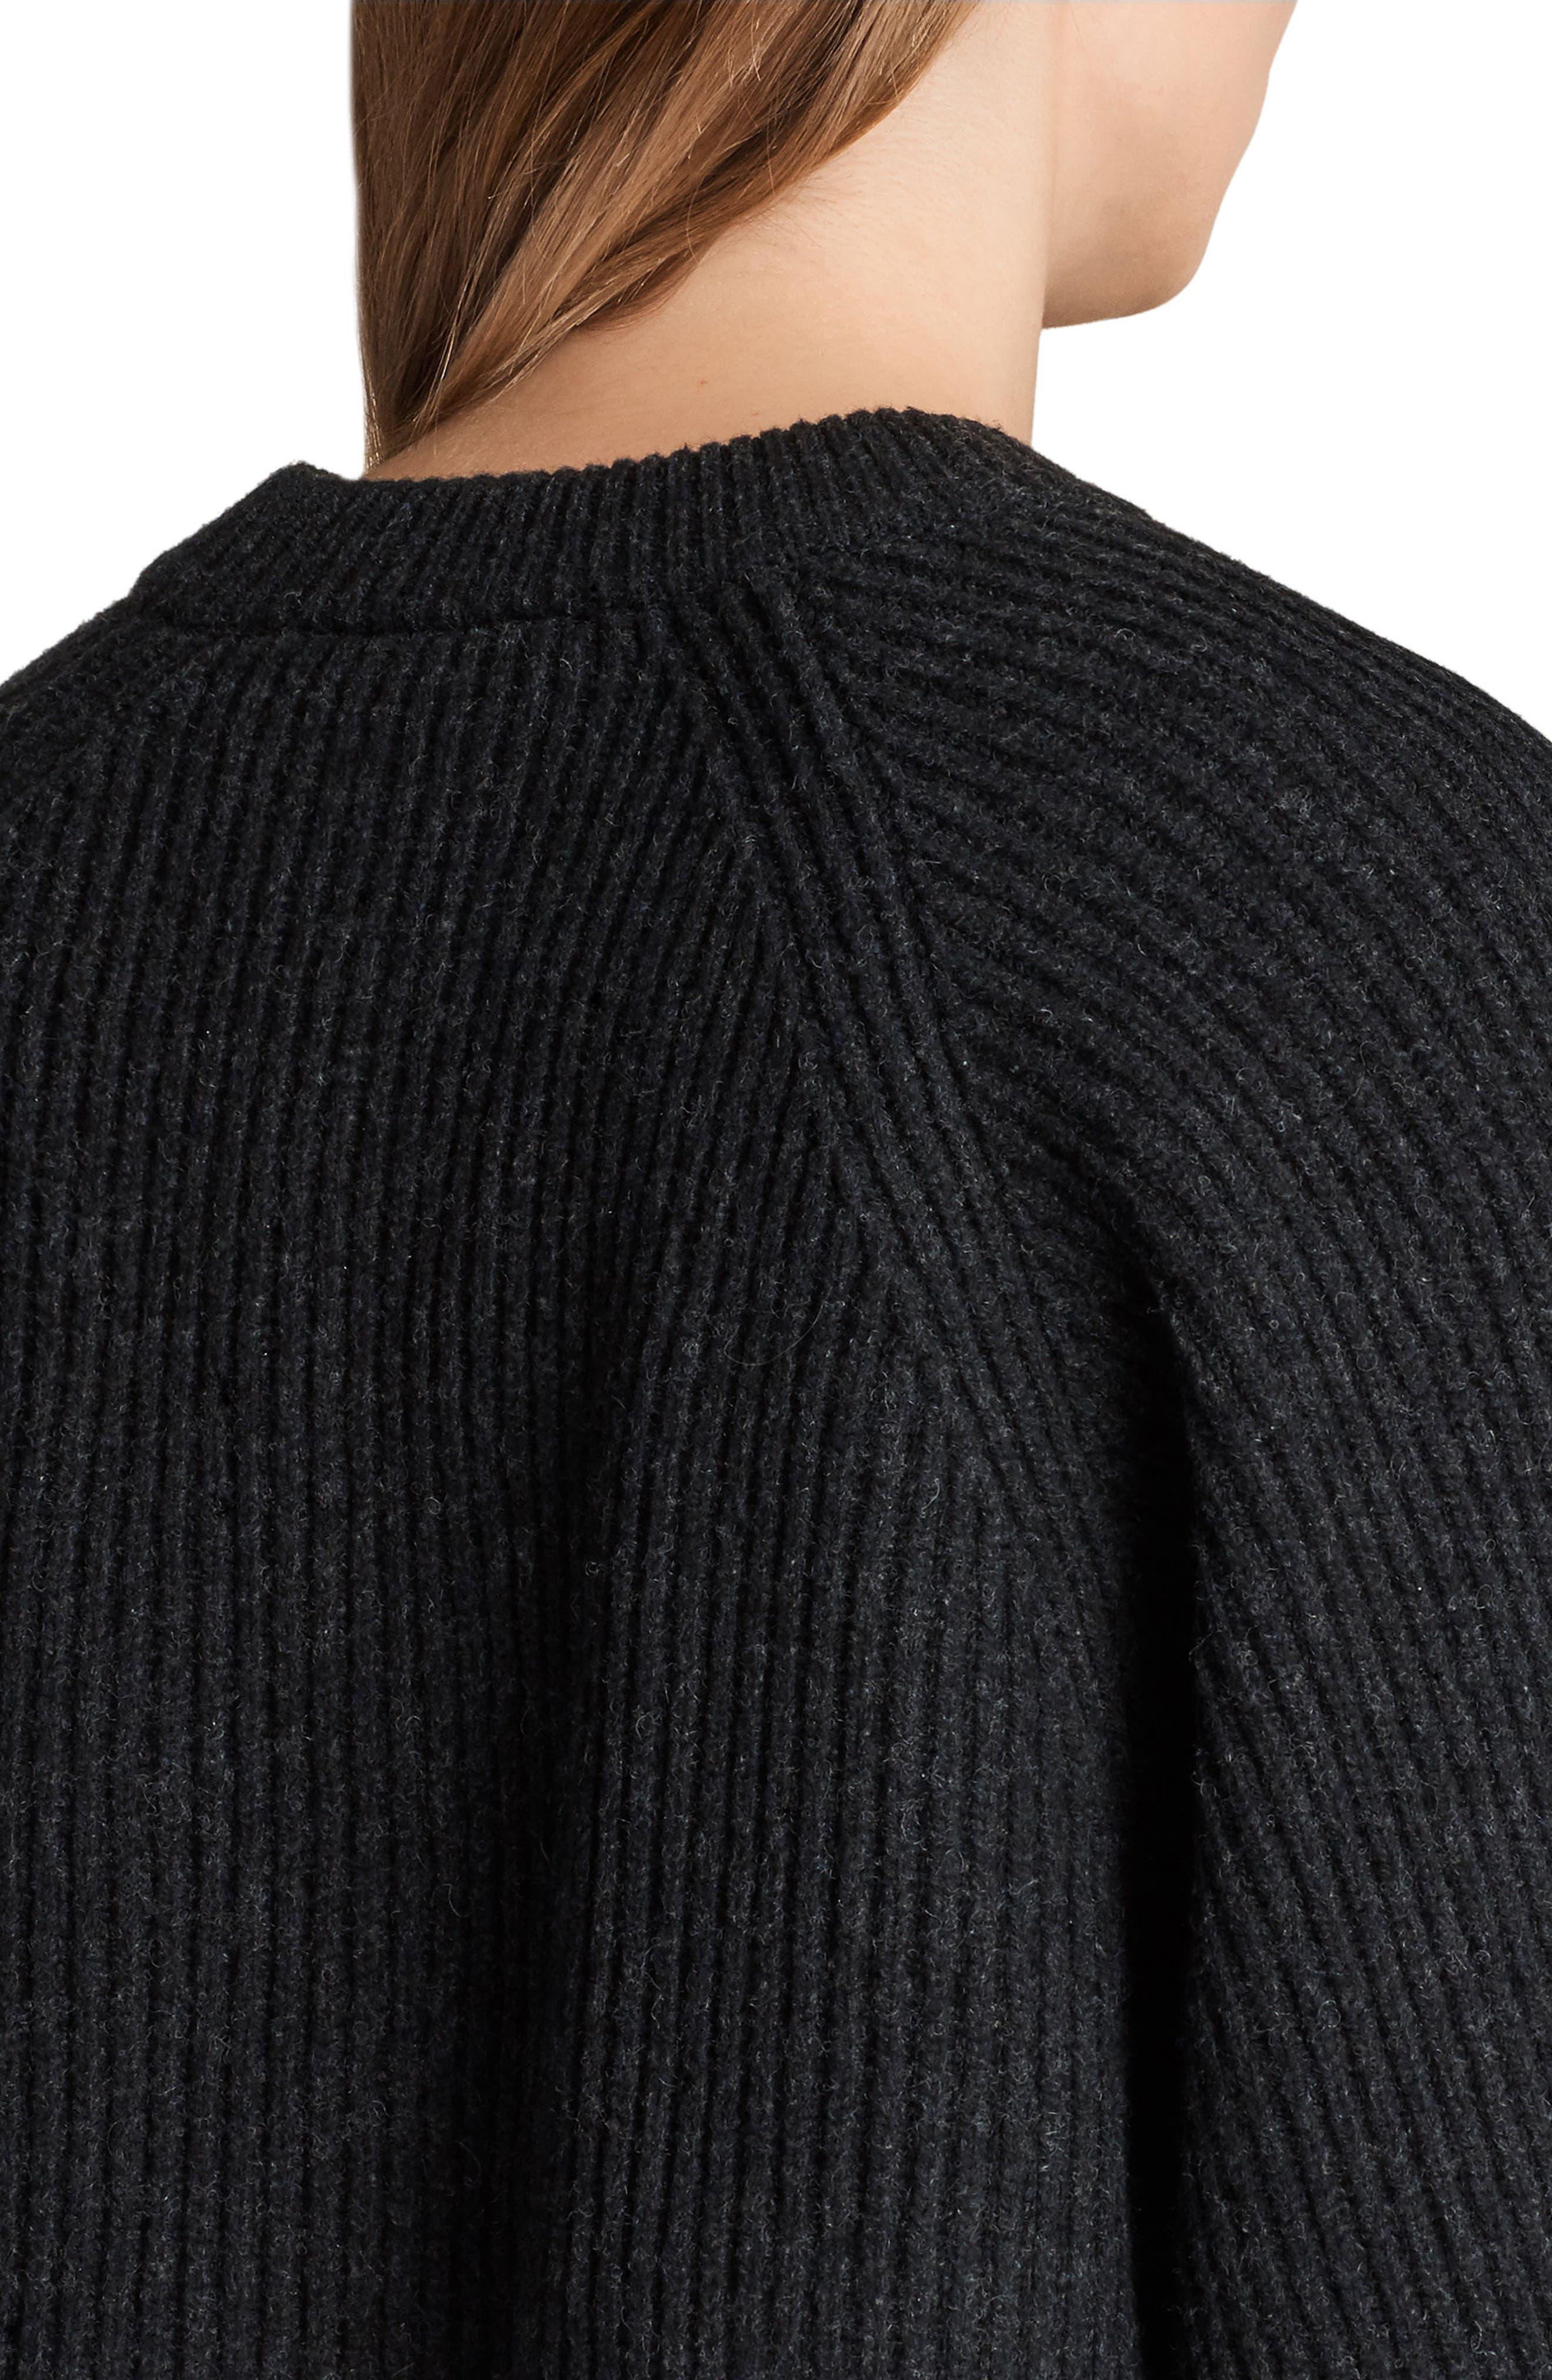 Sura Sweater Dress,                             Alternate thumbnail 5, color,                             007